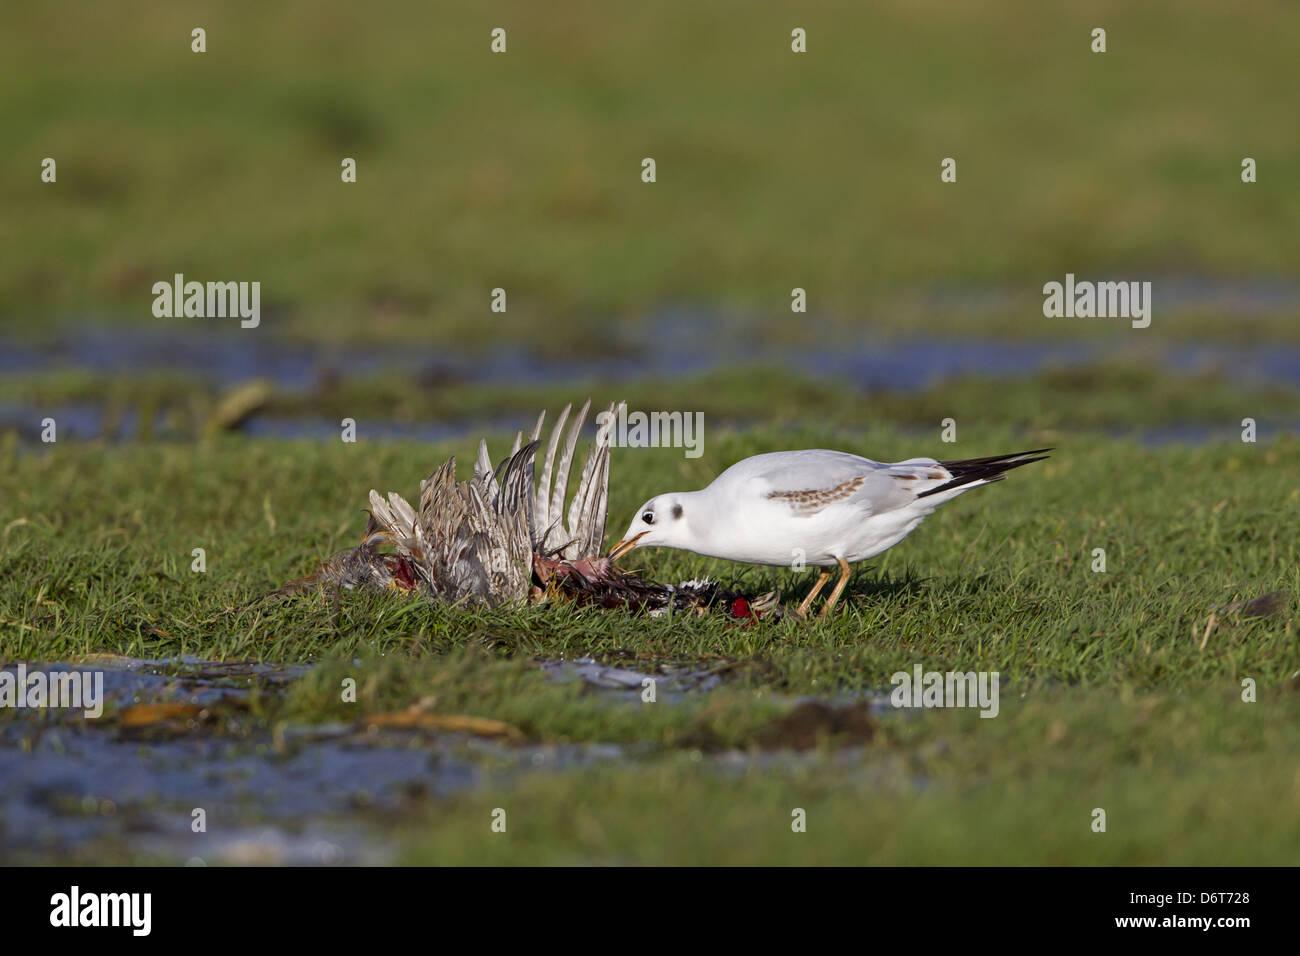 Black-headed Gull Larus ridibundus immature first winter plumage feeding on dead Common Pheasant Phasianus colchicus - Stock Image